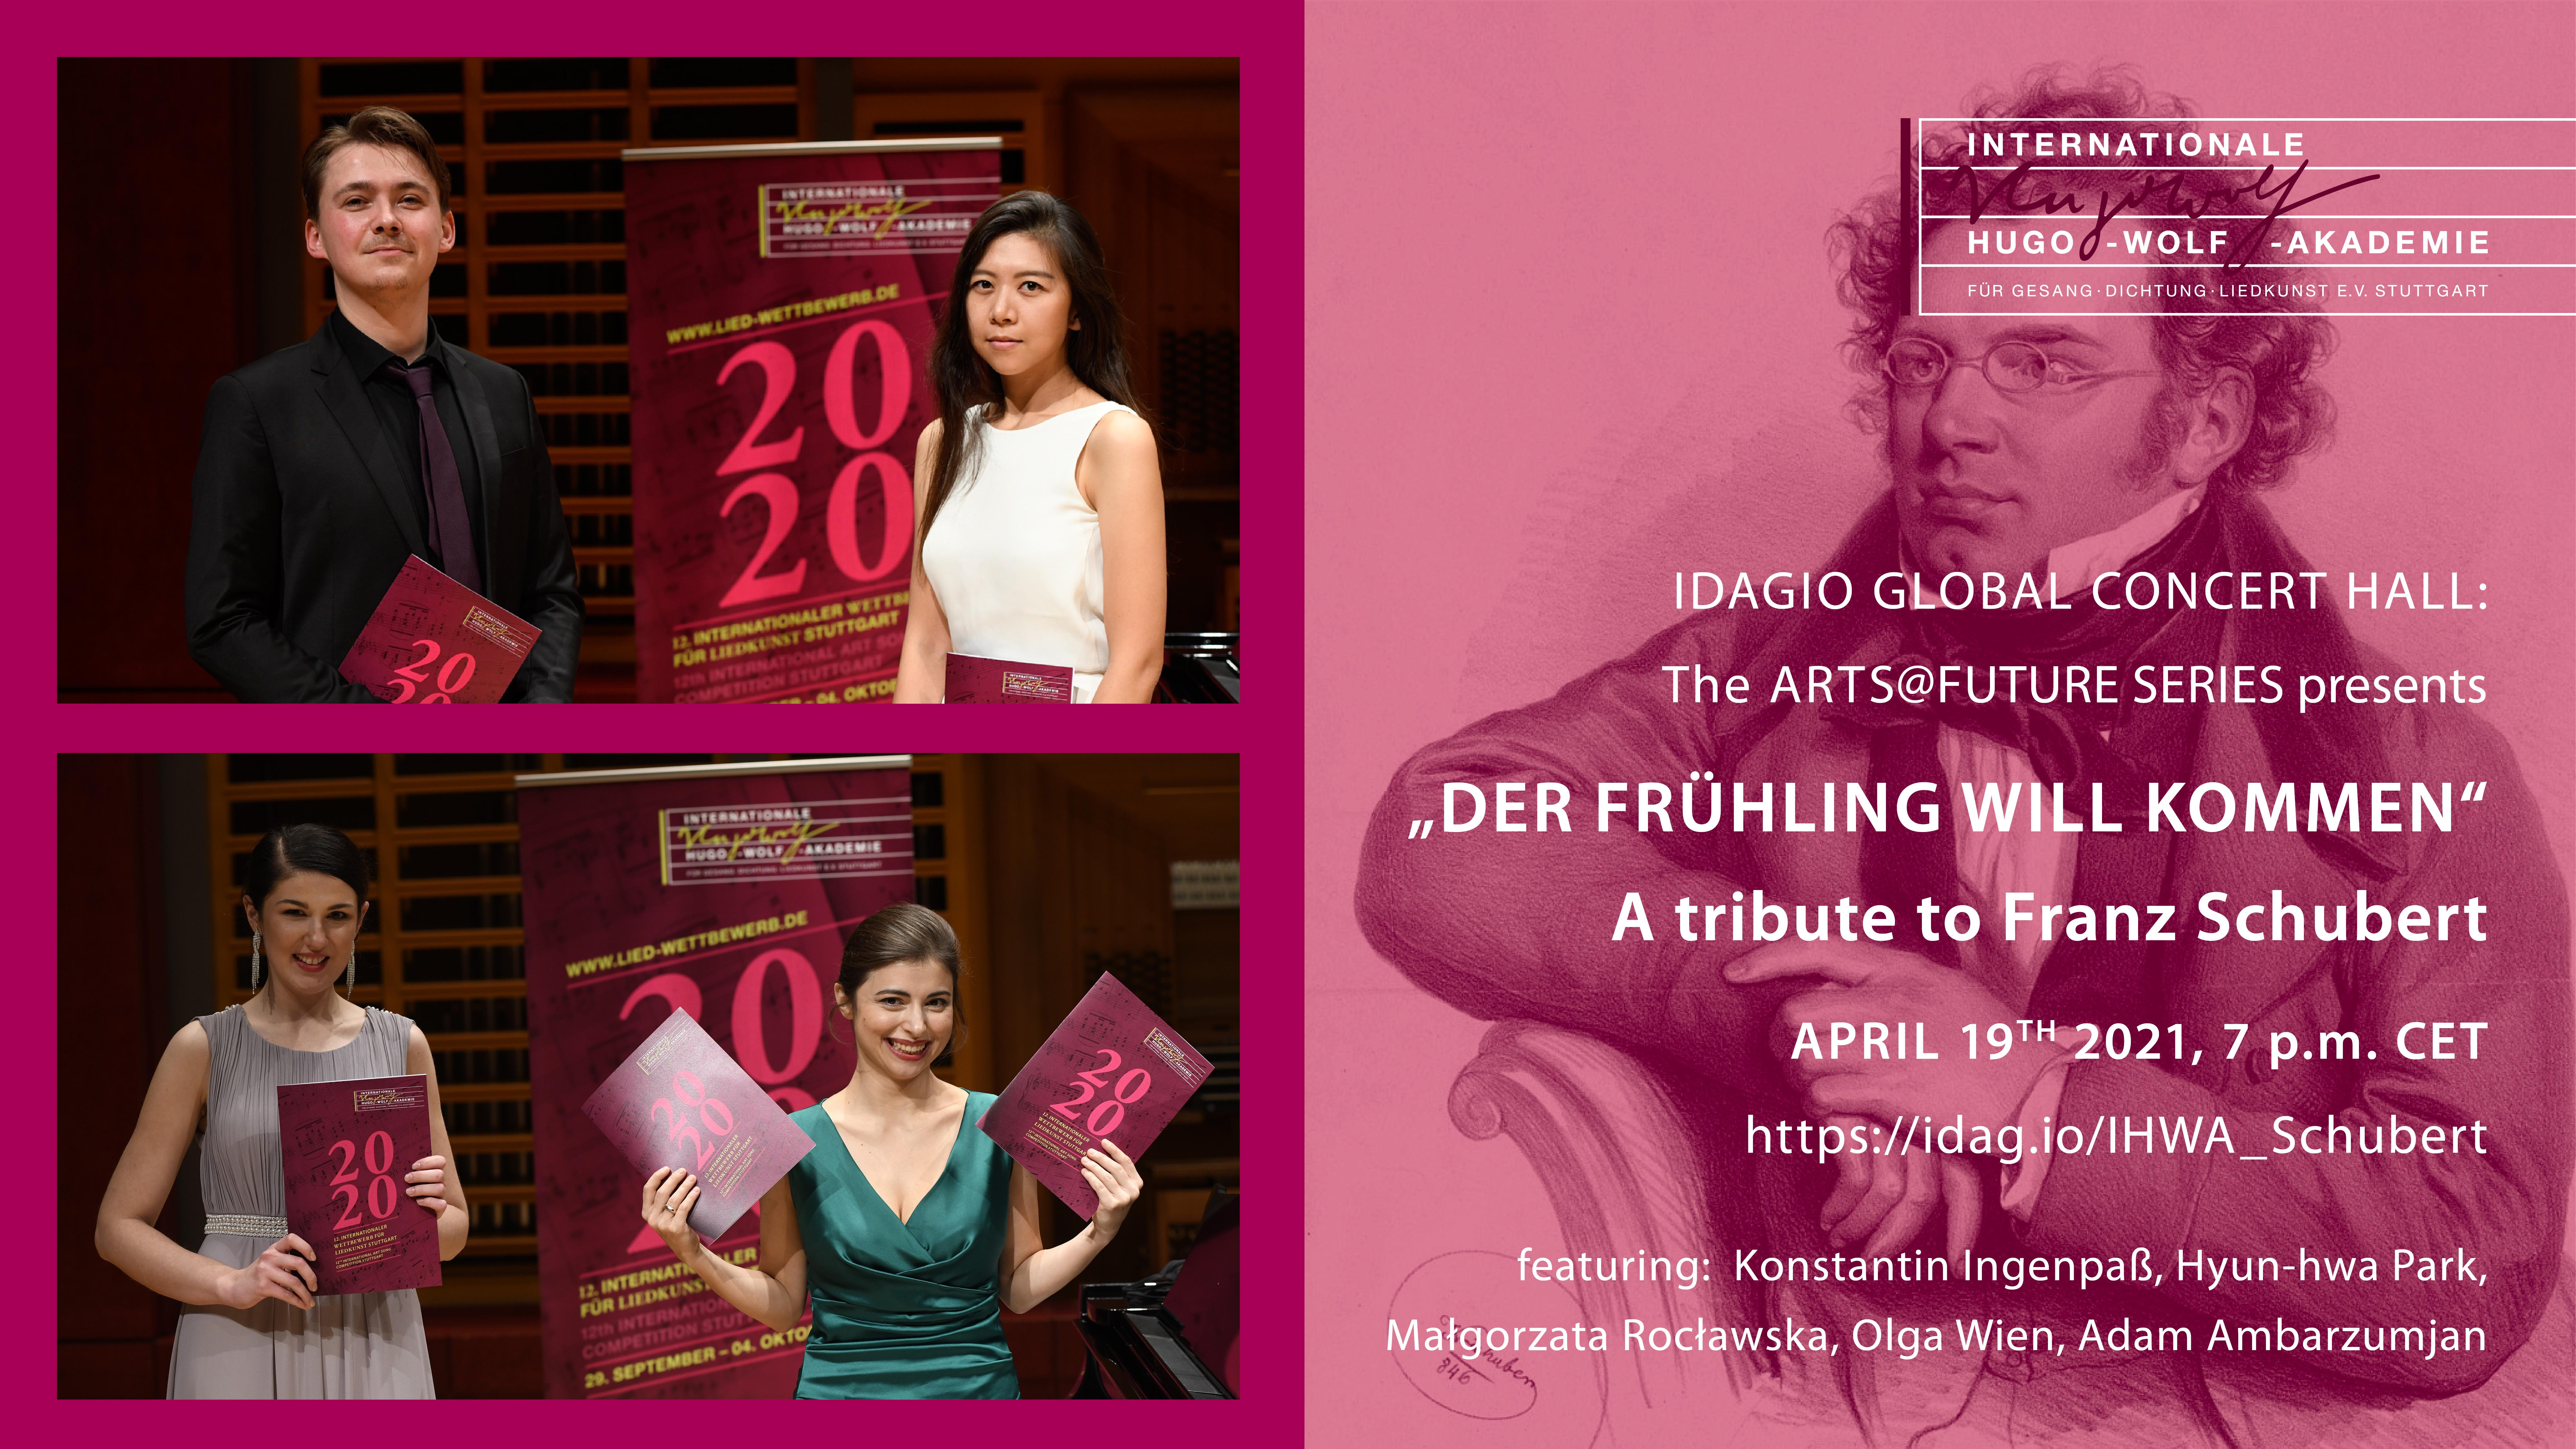 IDAGIO Global Concert Hall - Schubert Special